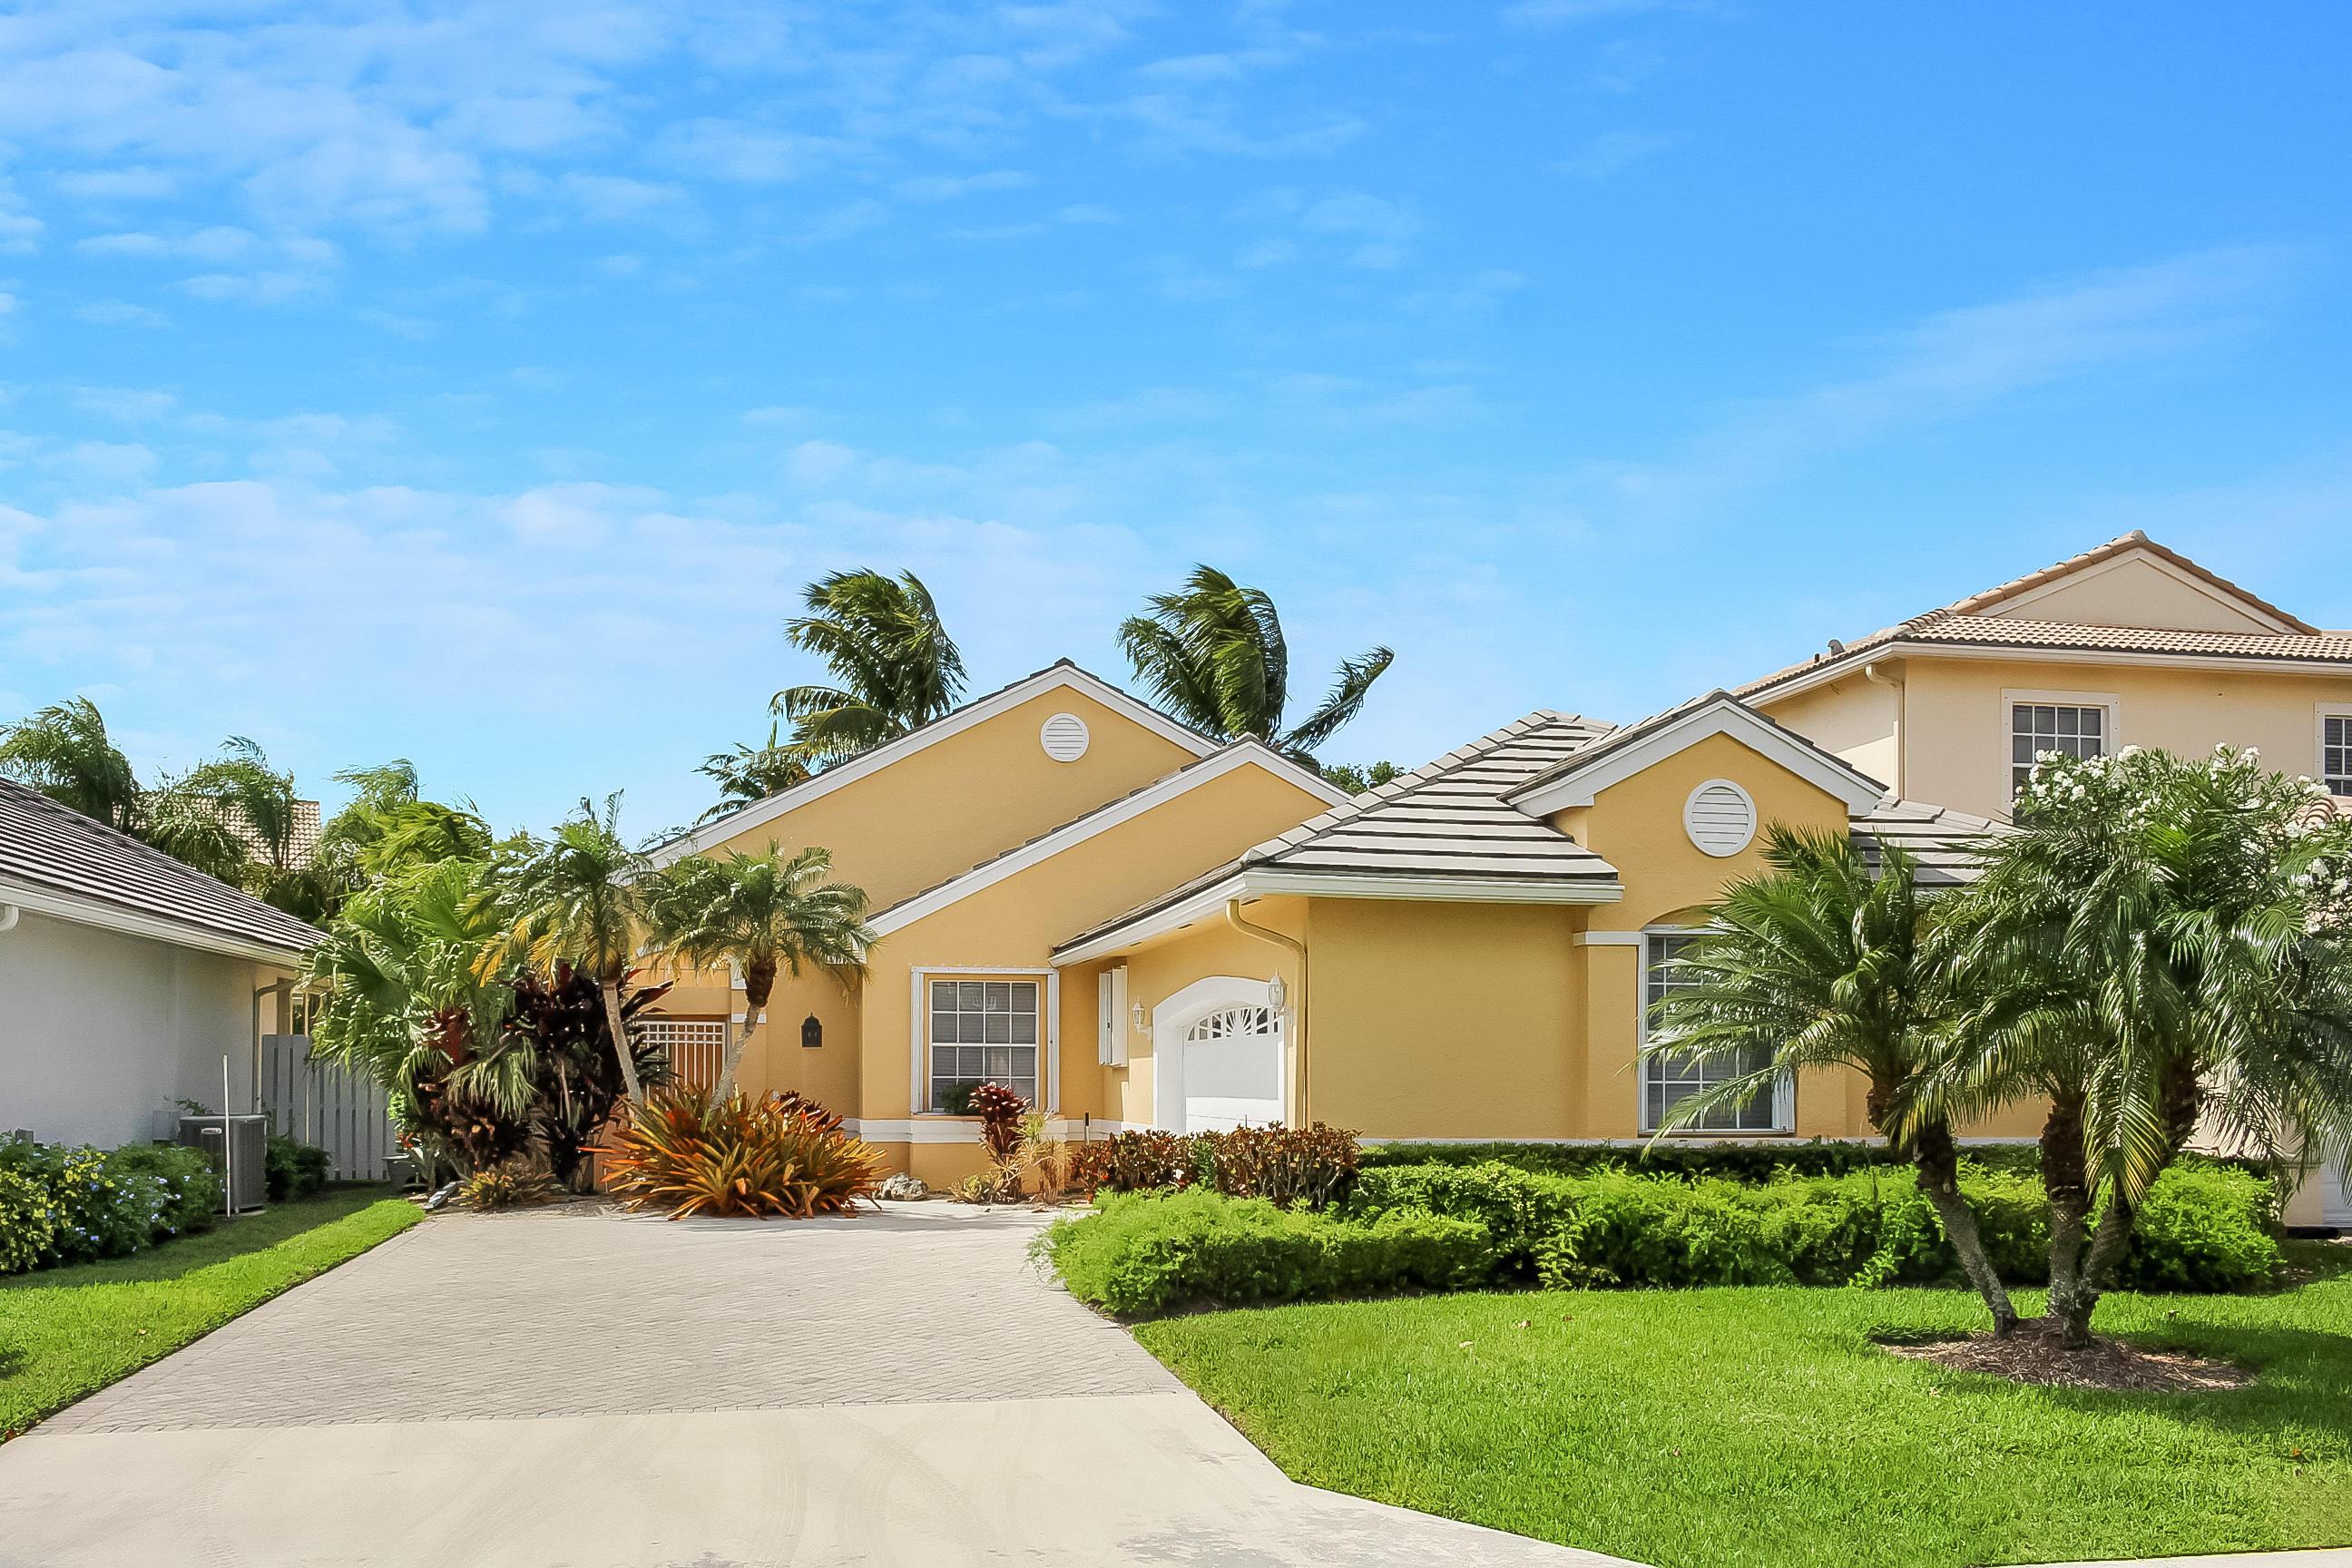 8273 Bob O Link Drive, West Palm Beach, Florida 33412, 2 Bedrooms Bedrooms, ,2 BathroomsBathrooms,A,Villa,Bob O Link,RX-10517102